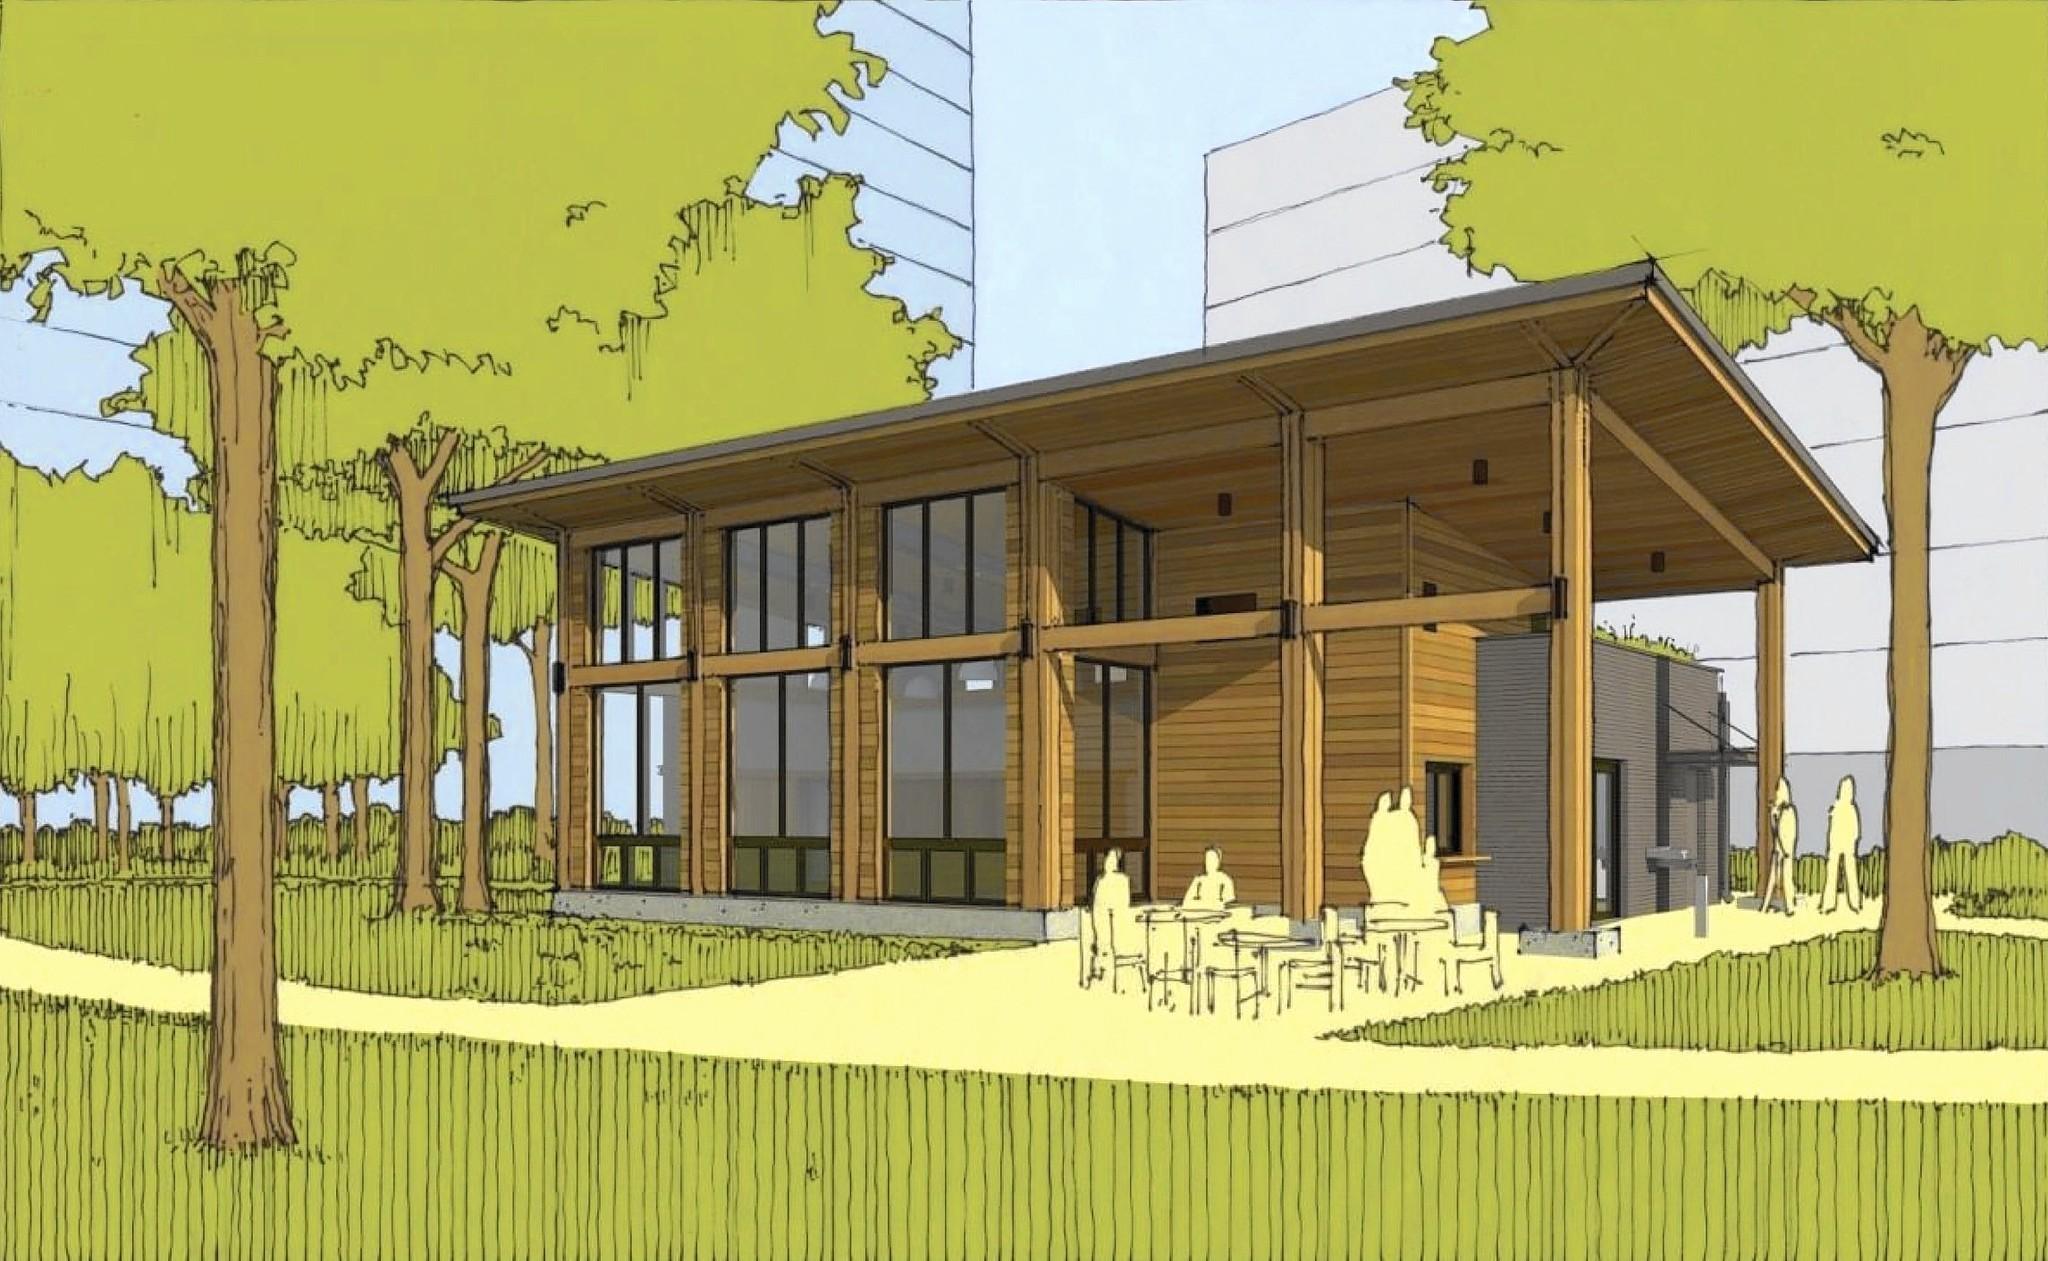 Environmental Education Center Opening Village Of Oak Park